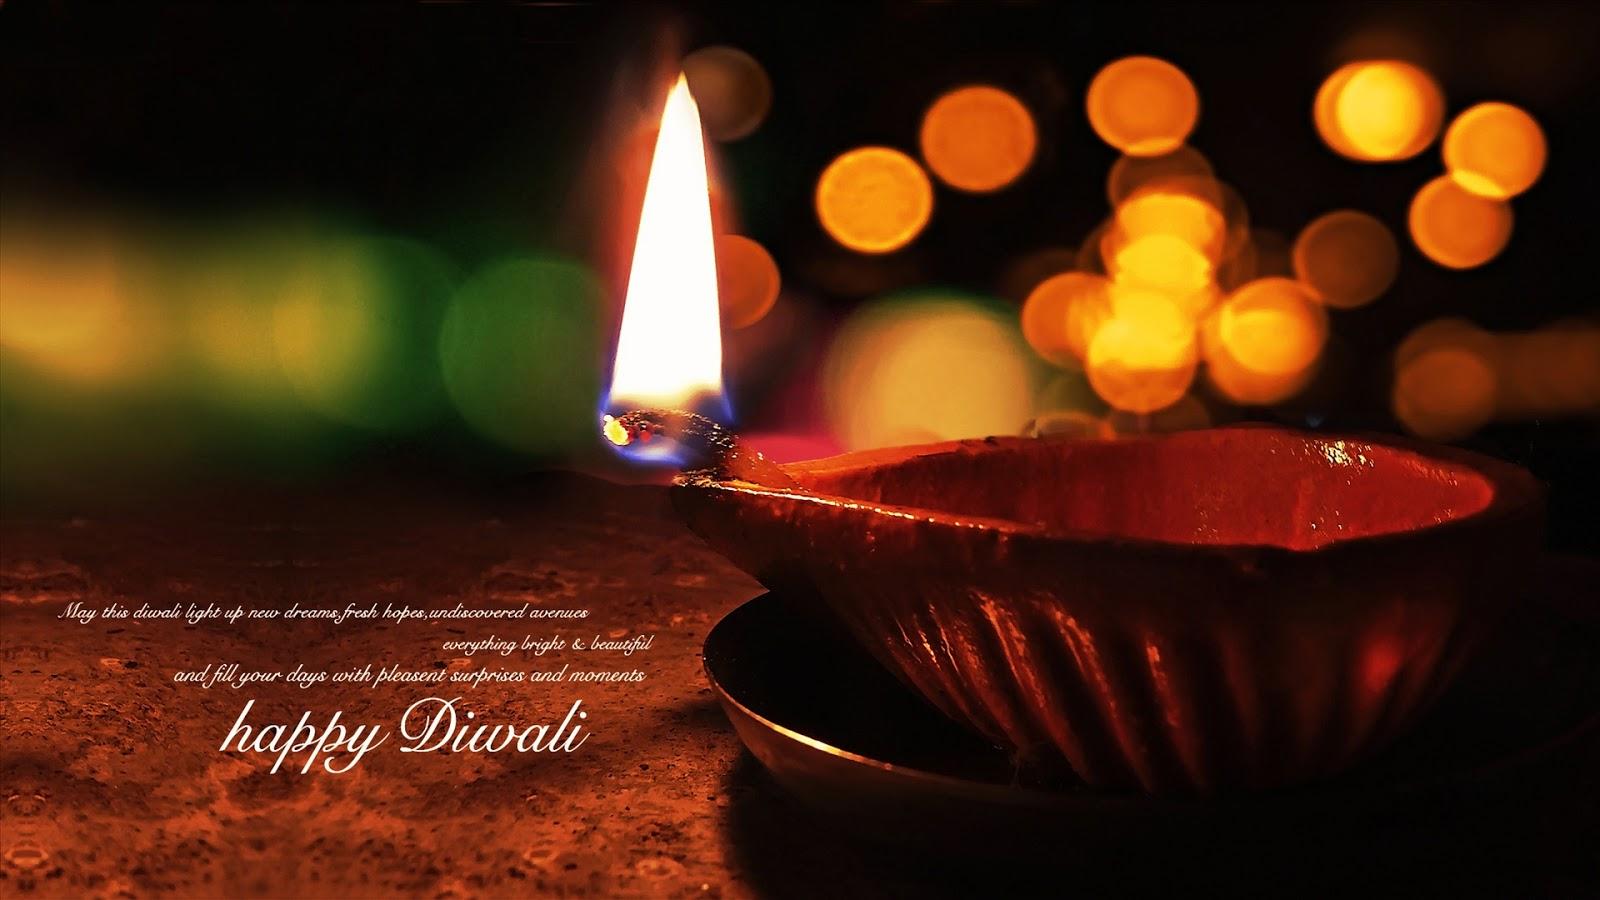 Image result for happy diwali dp images